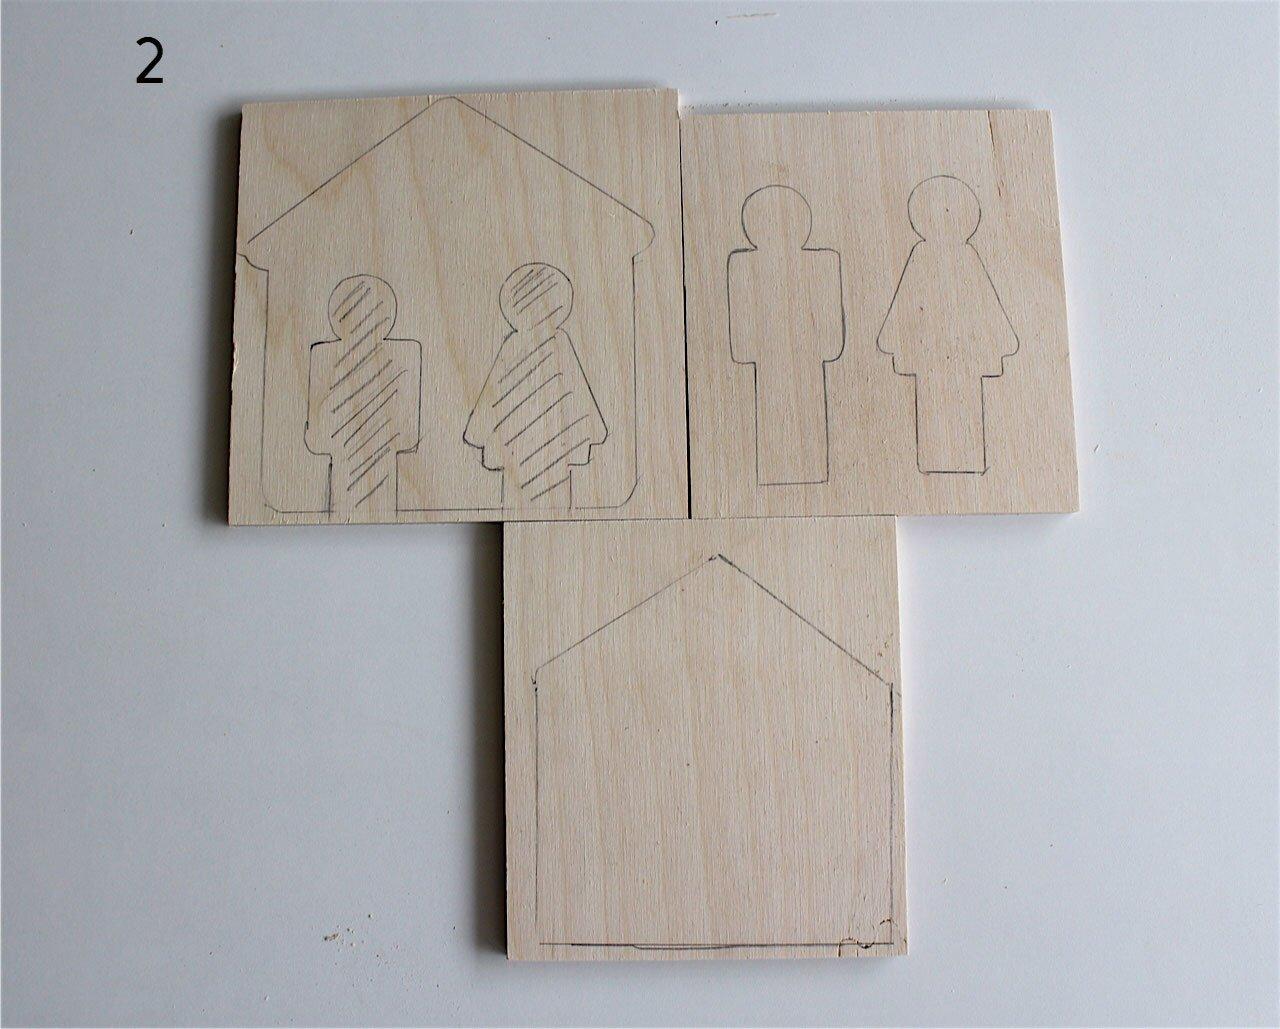 Il portachiavi in legno da parete cose di casa - Portachiavi da parete ...